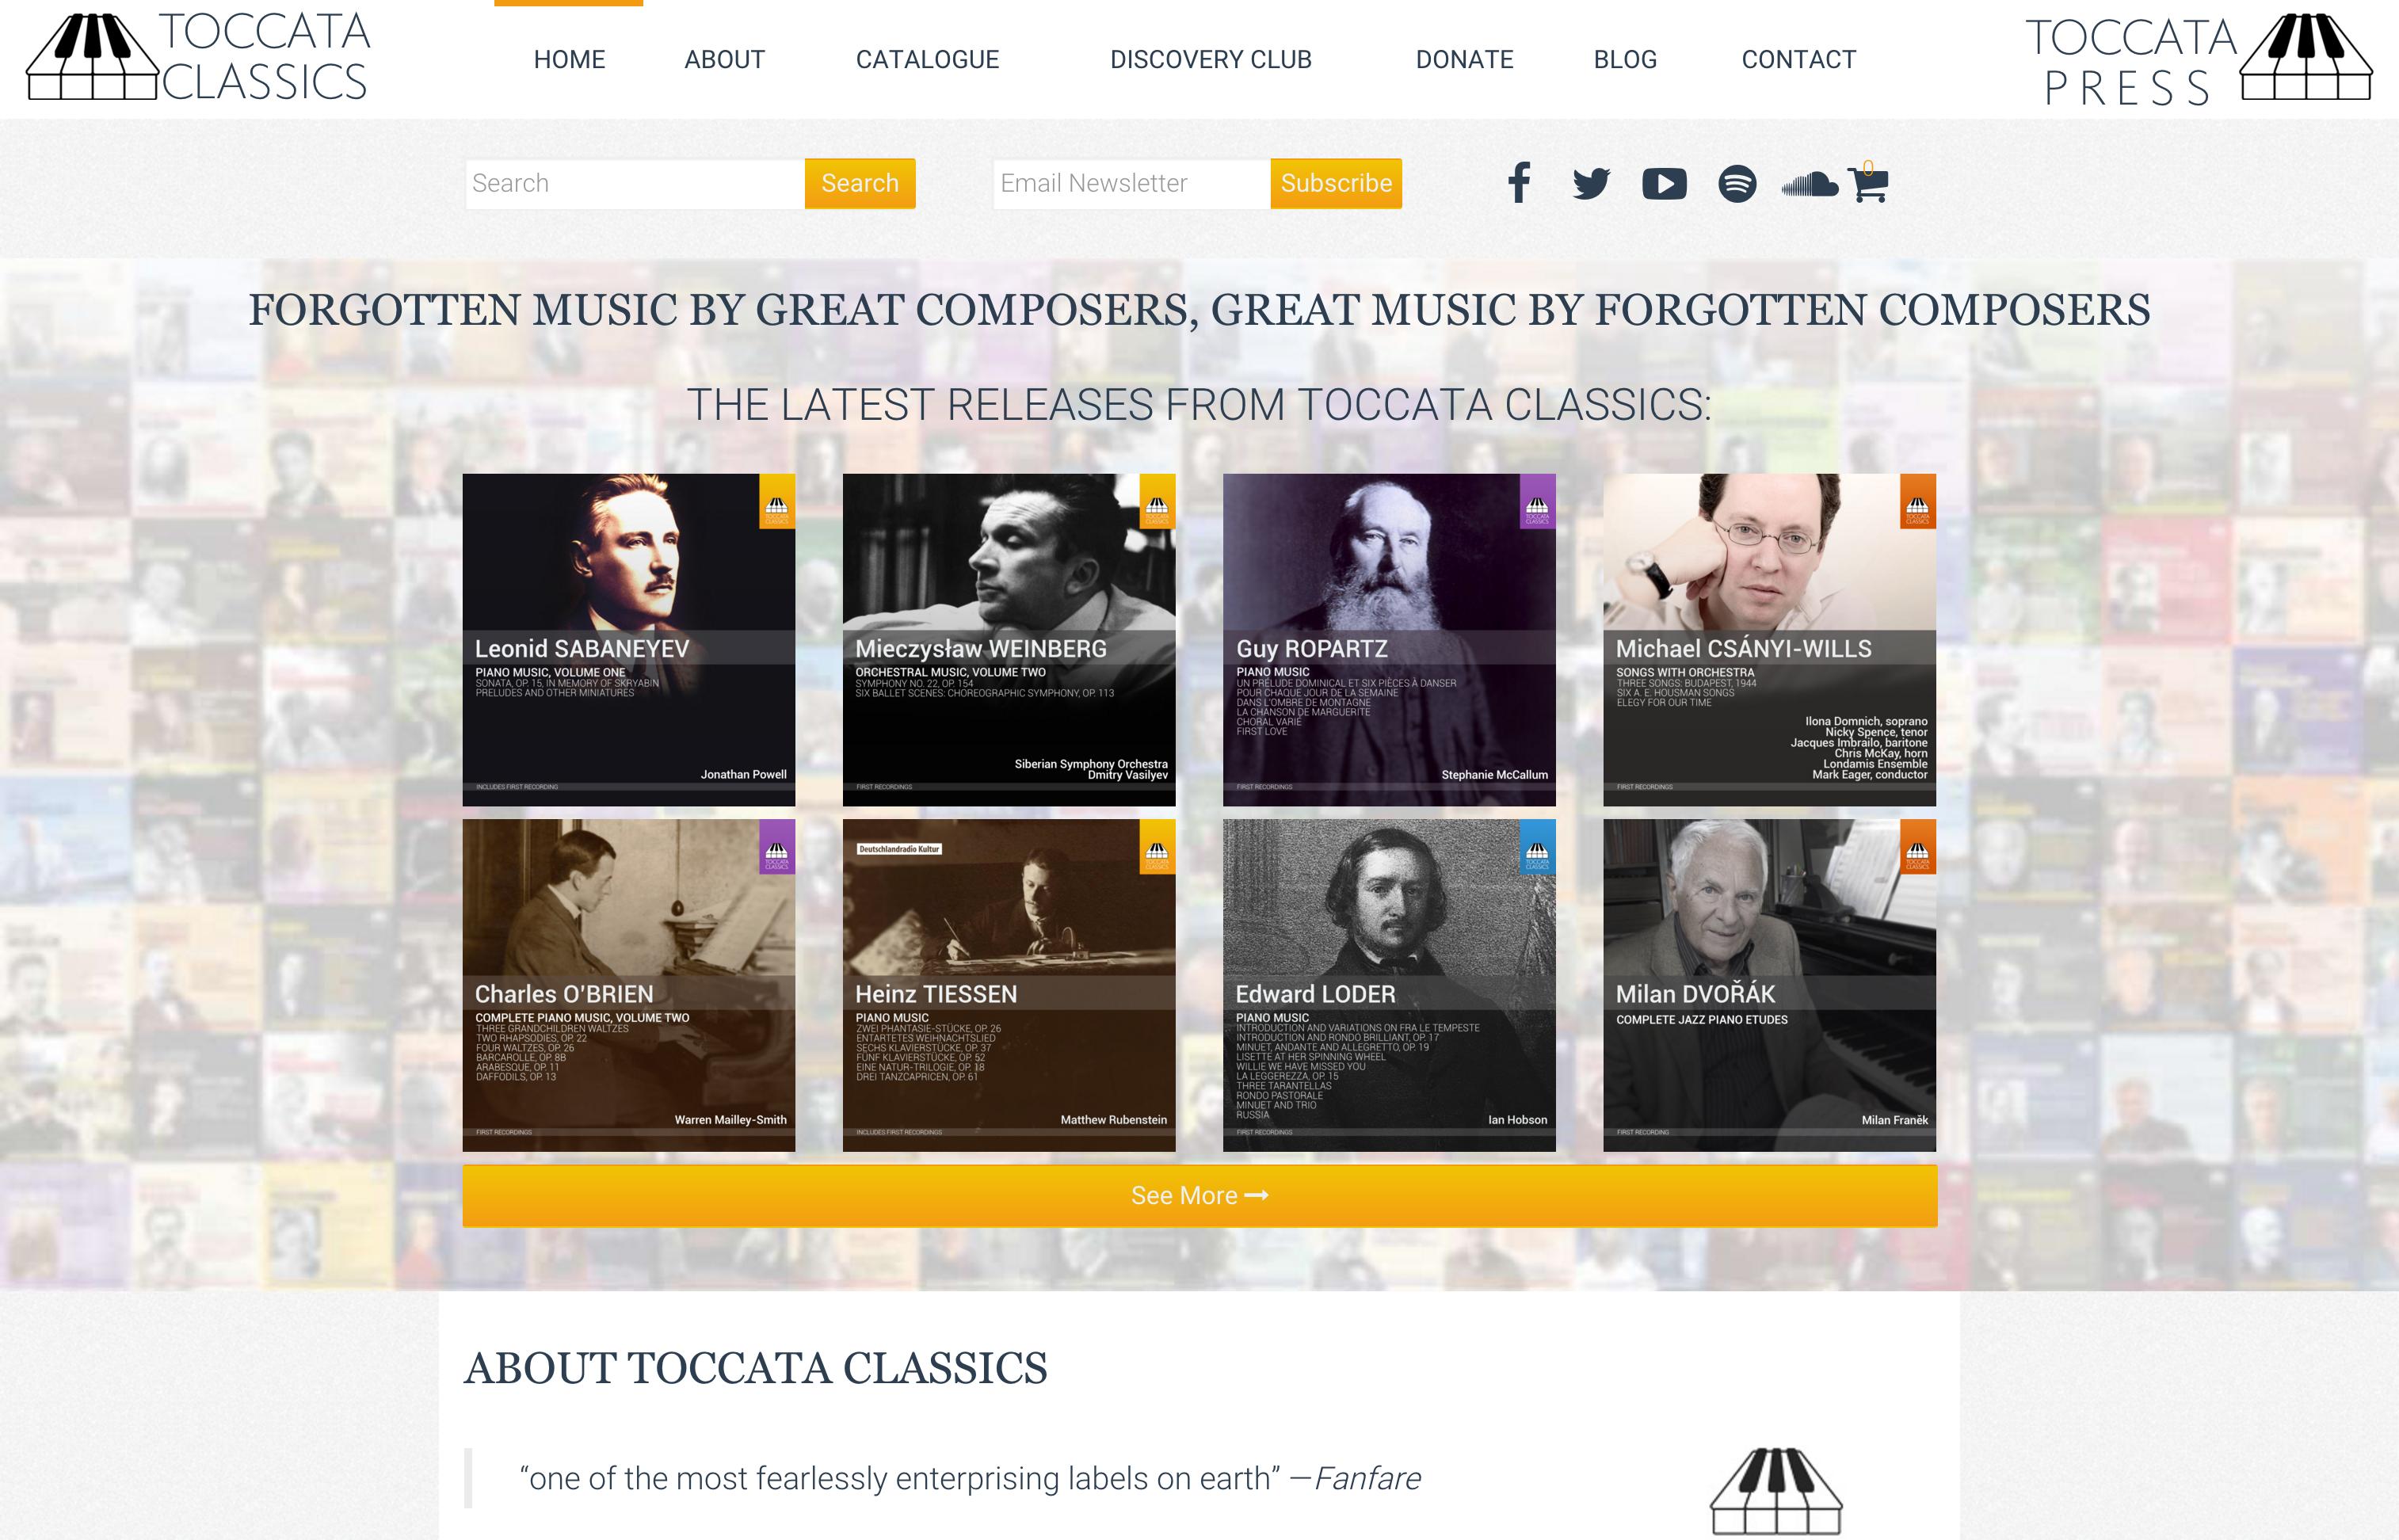 Toccata Classics | Toccata Press